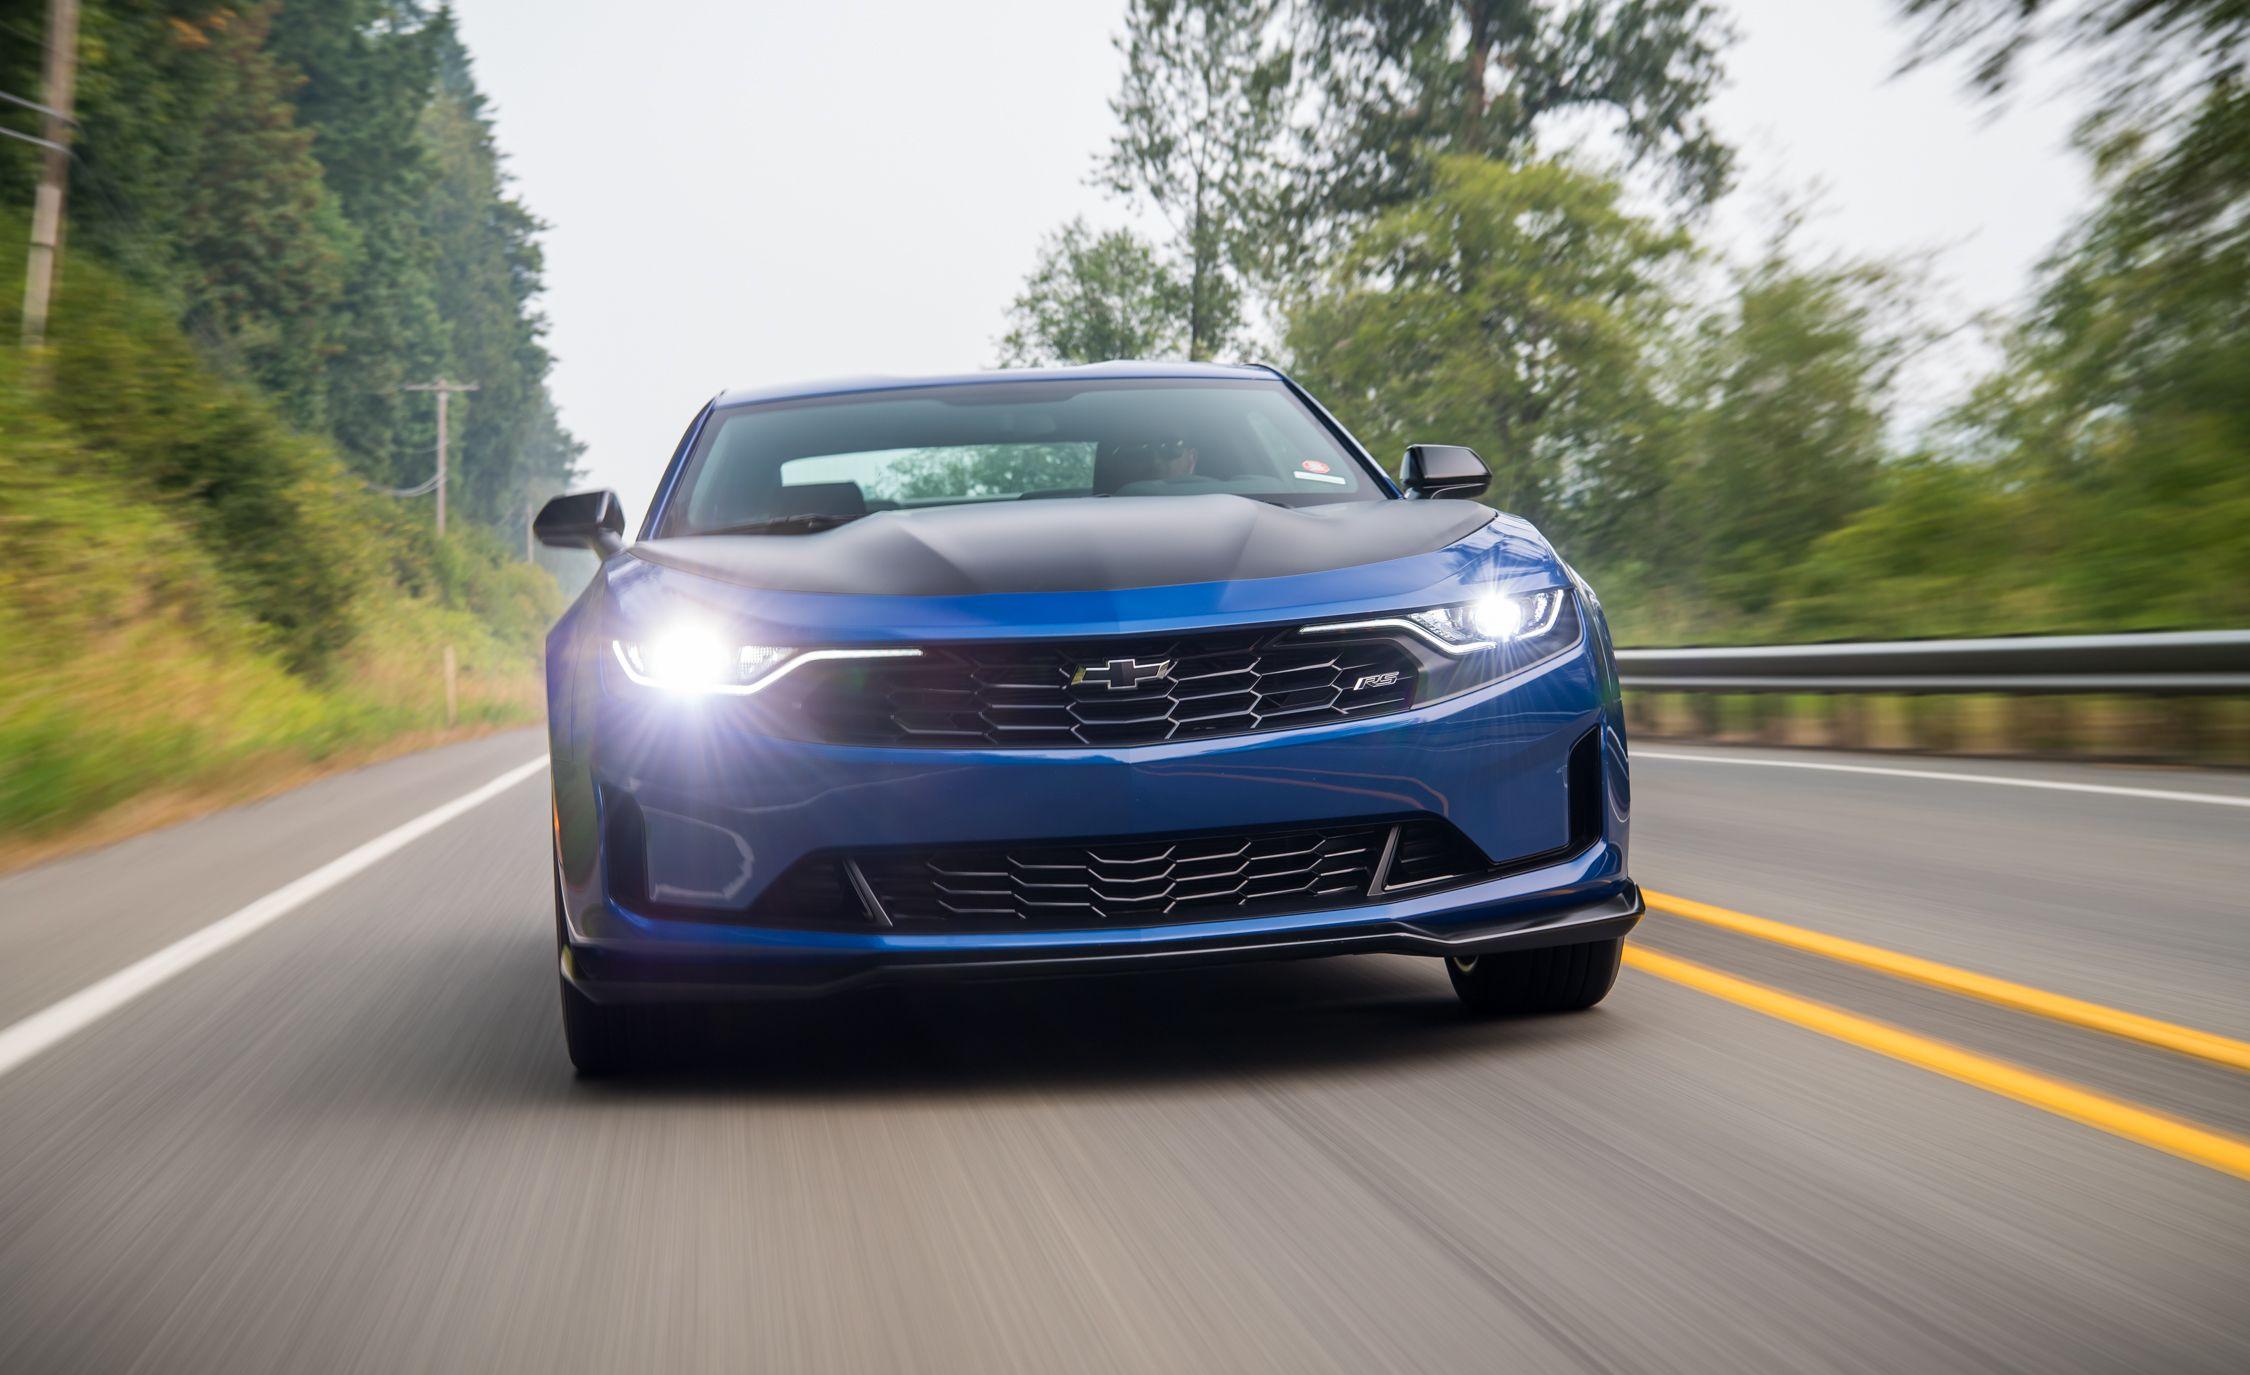 2019 Chevrolet Camaro 2.0T 1LE